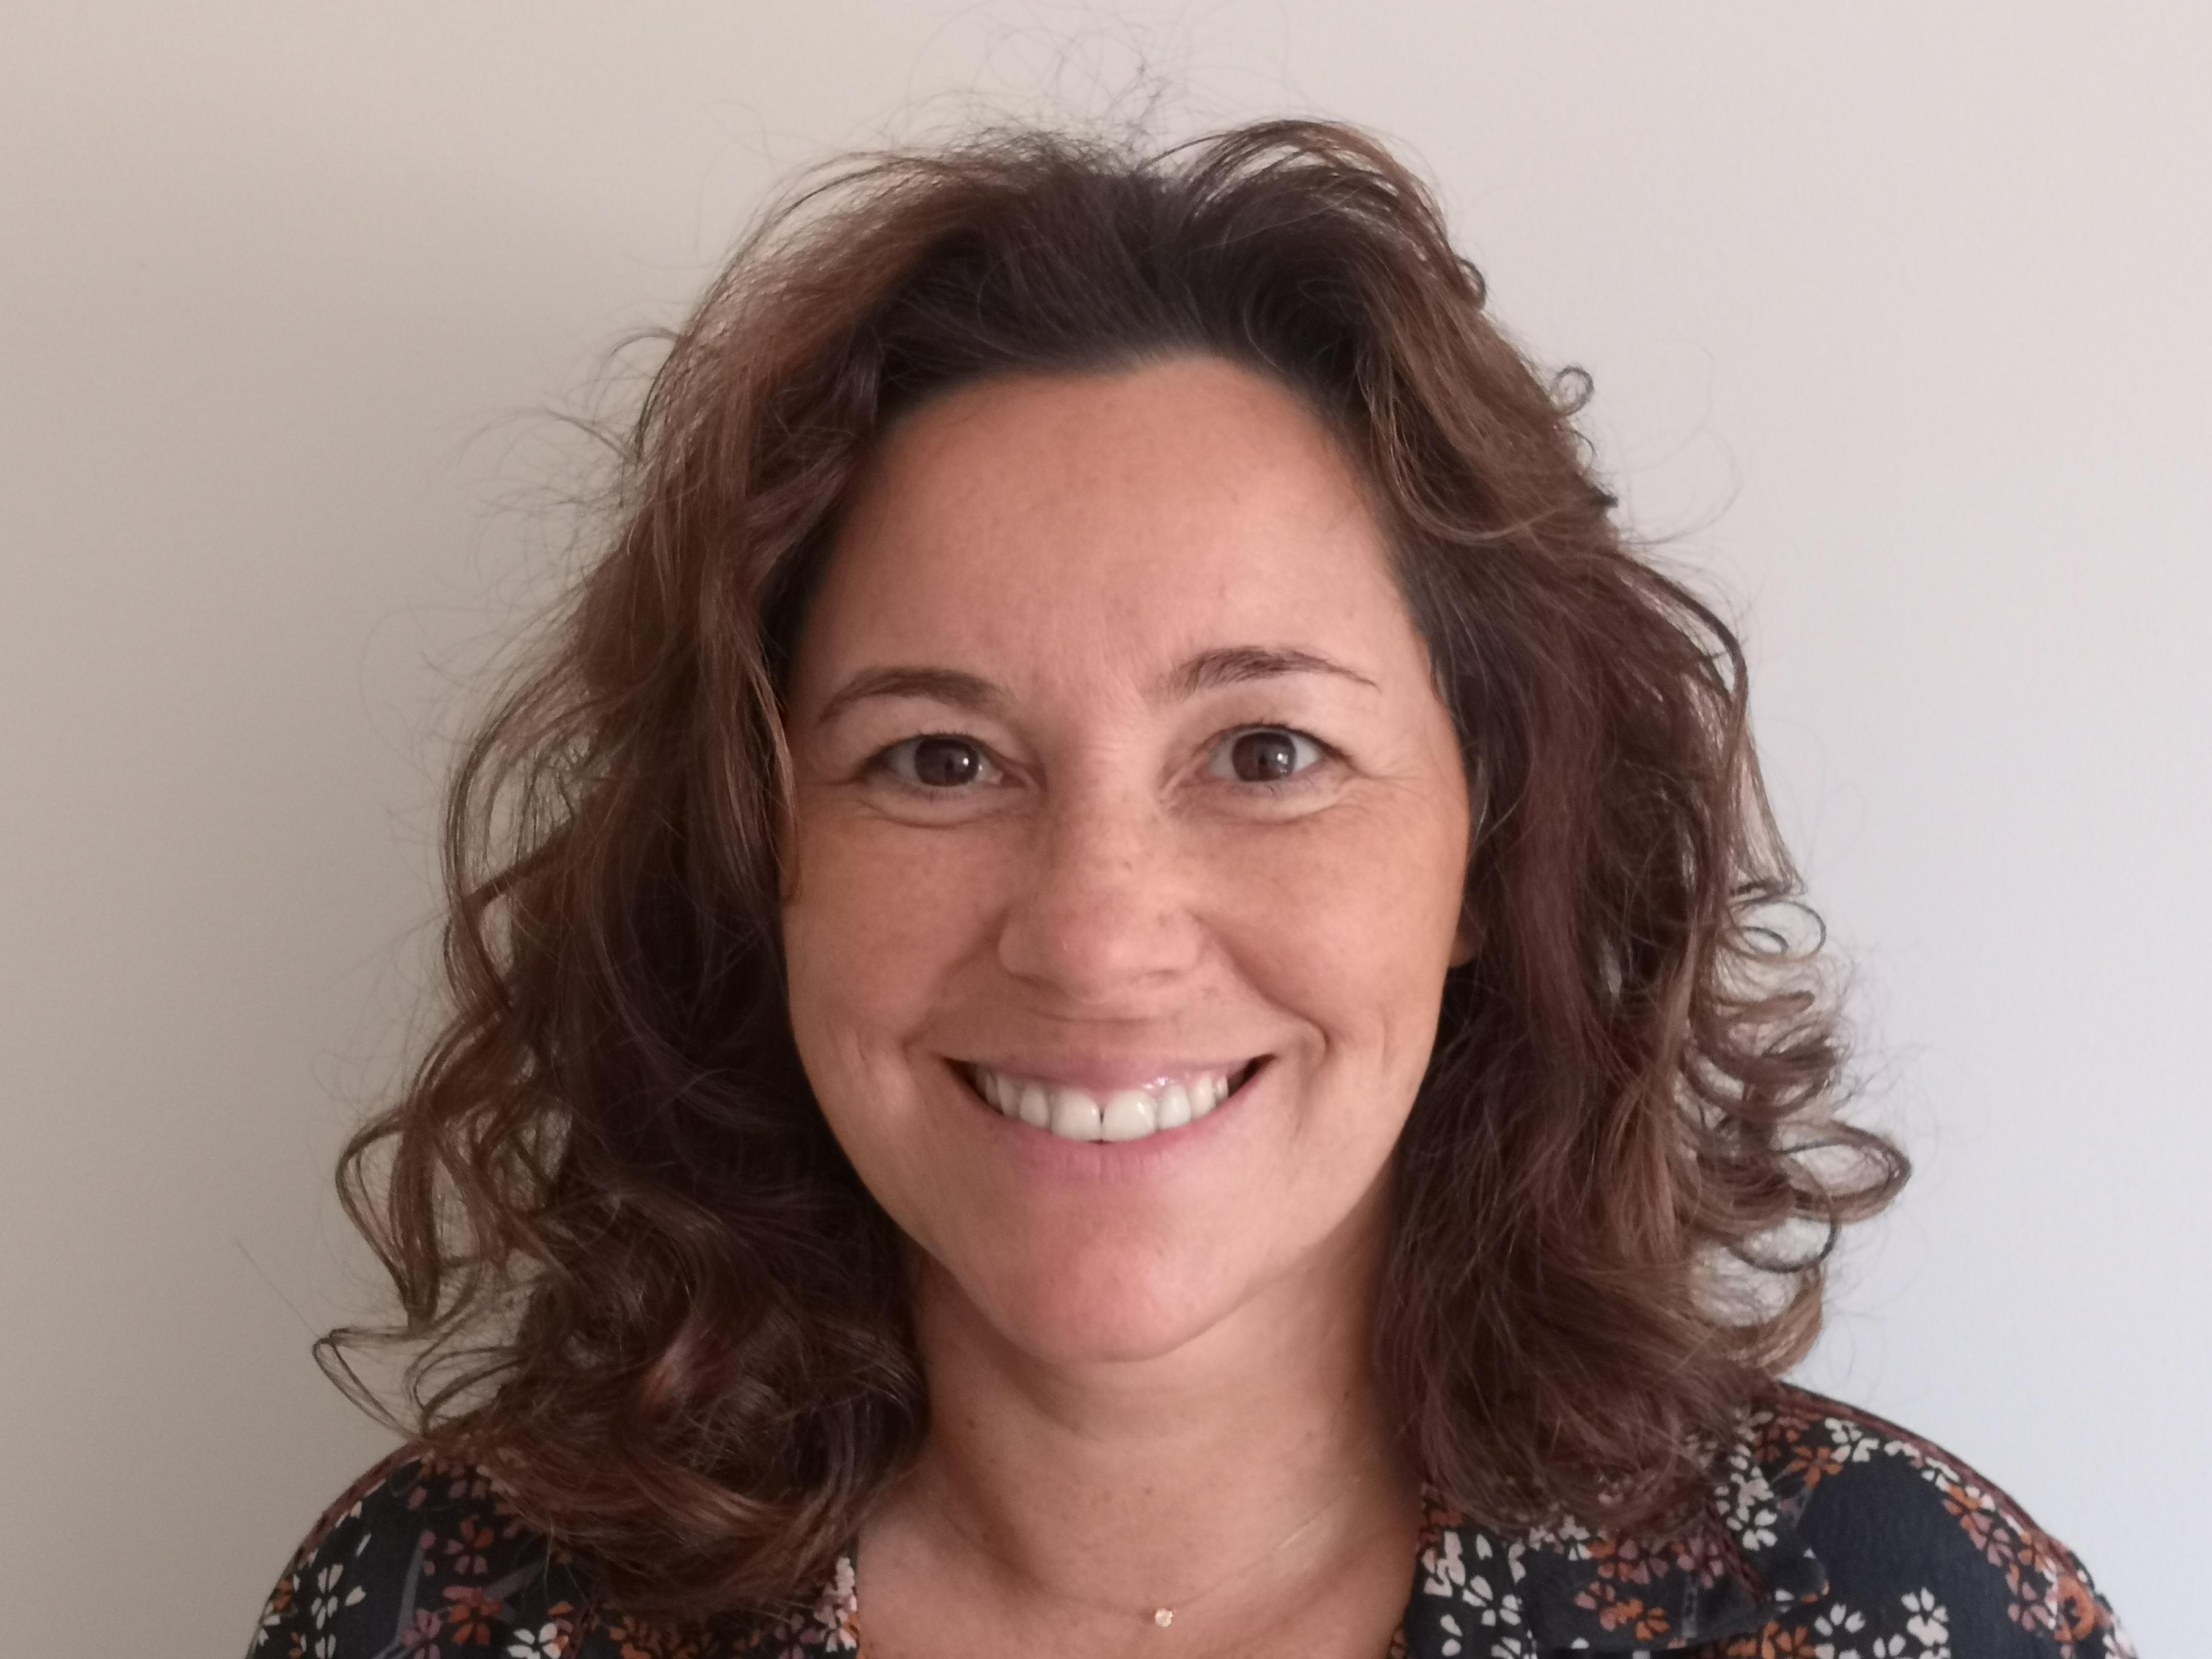 Dra. Marisa Ramos Pinto - Clínica Médica da Foz